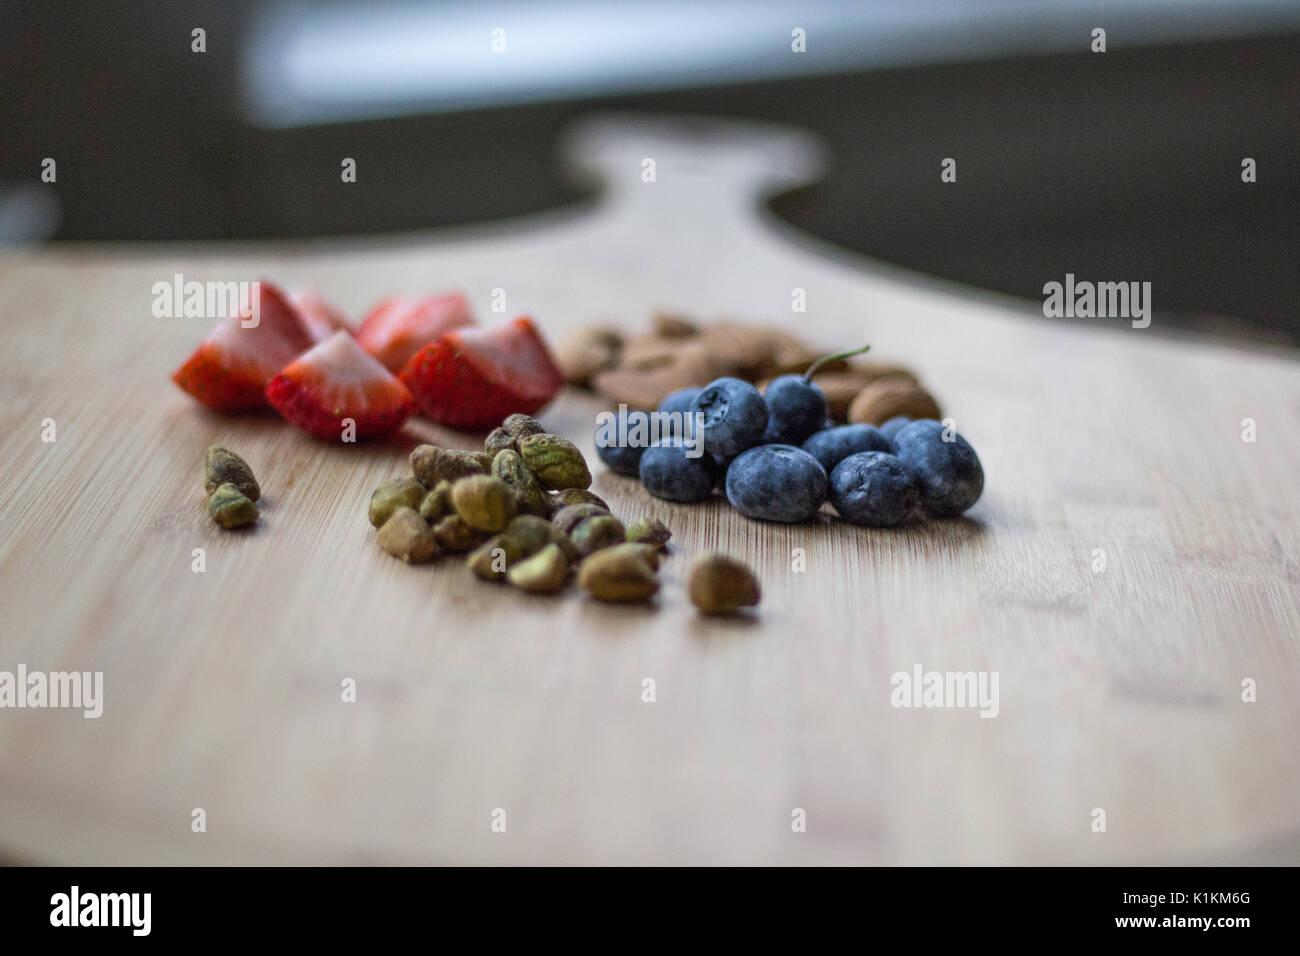 Gesundes Obst auf einem Holz Schneidebretter Stockbild